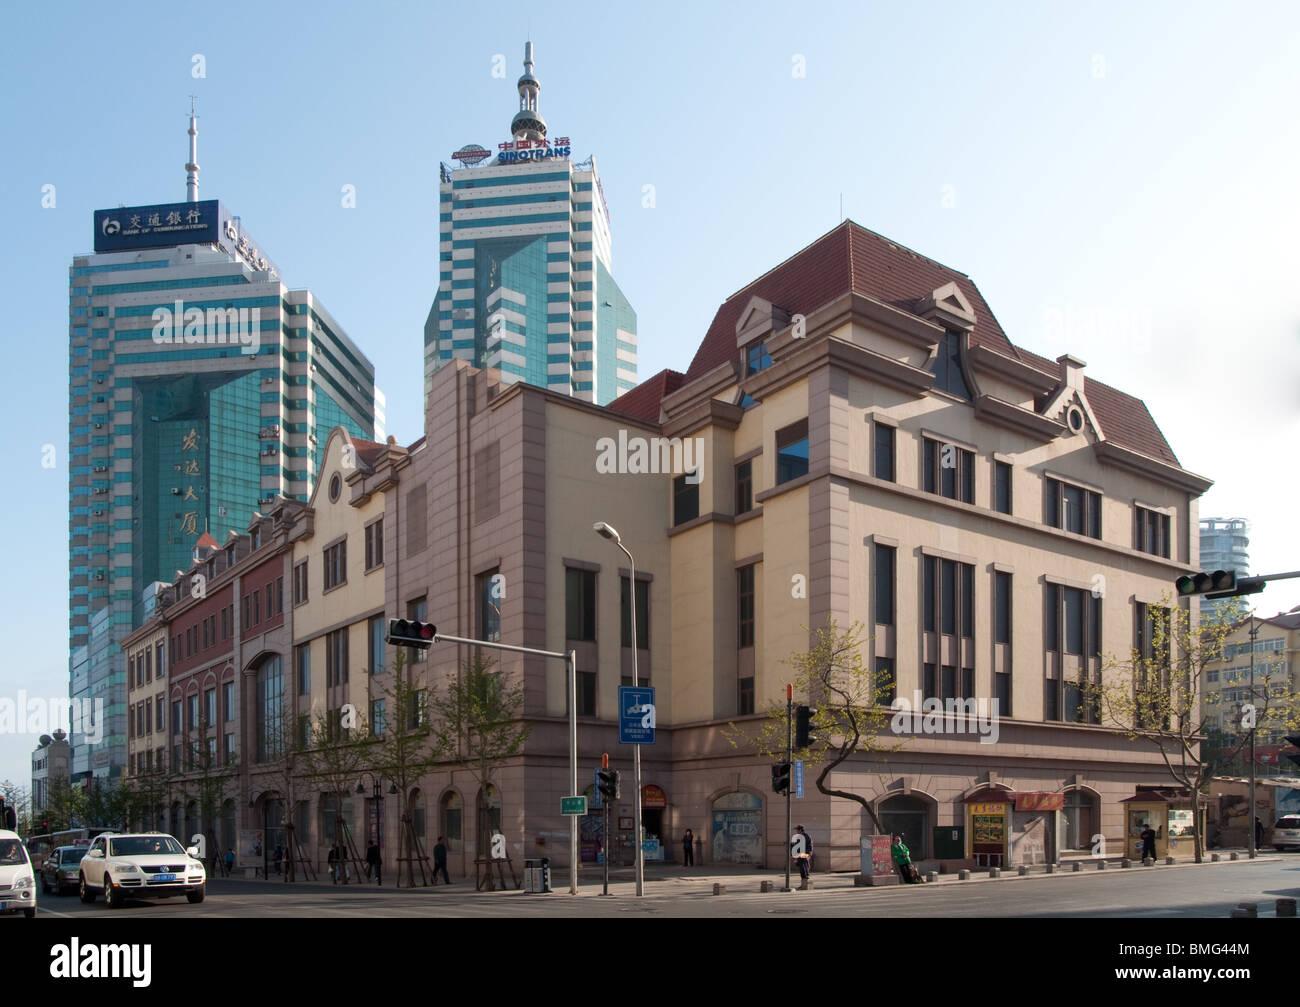 qingdao german architecture stock photos & qingdao german